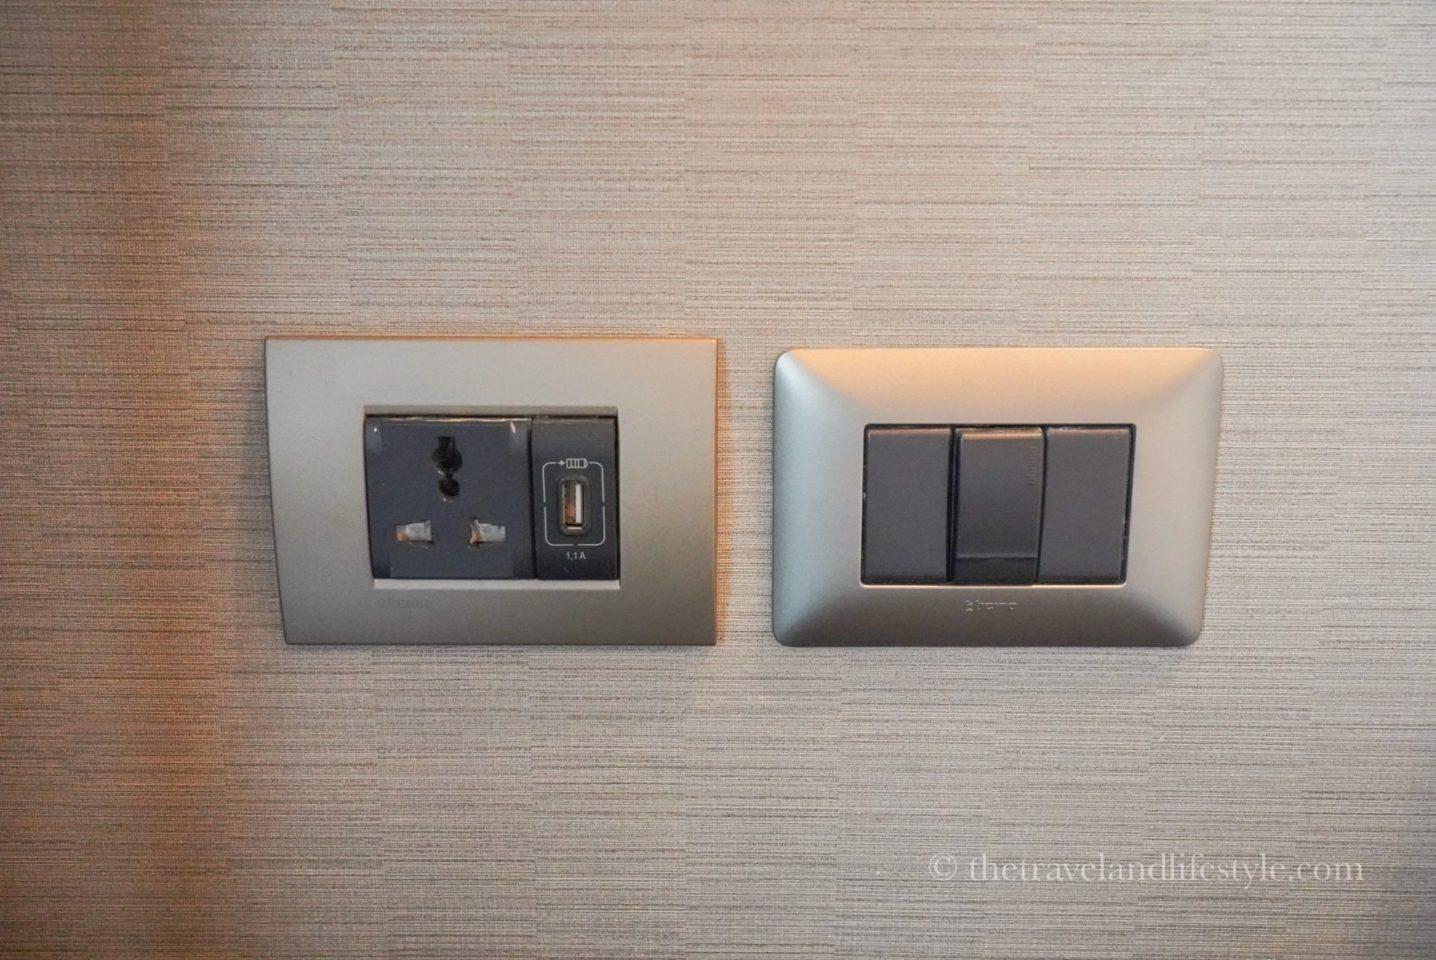 dsc07803 - akyra Thonglor Bangkok -  バンコクのラグジュアリーデザイナーズホテル